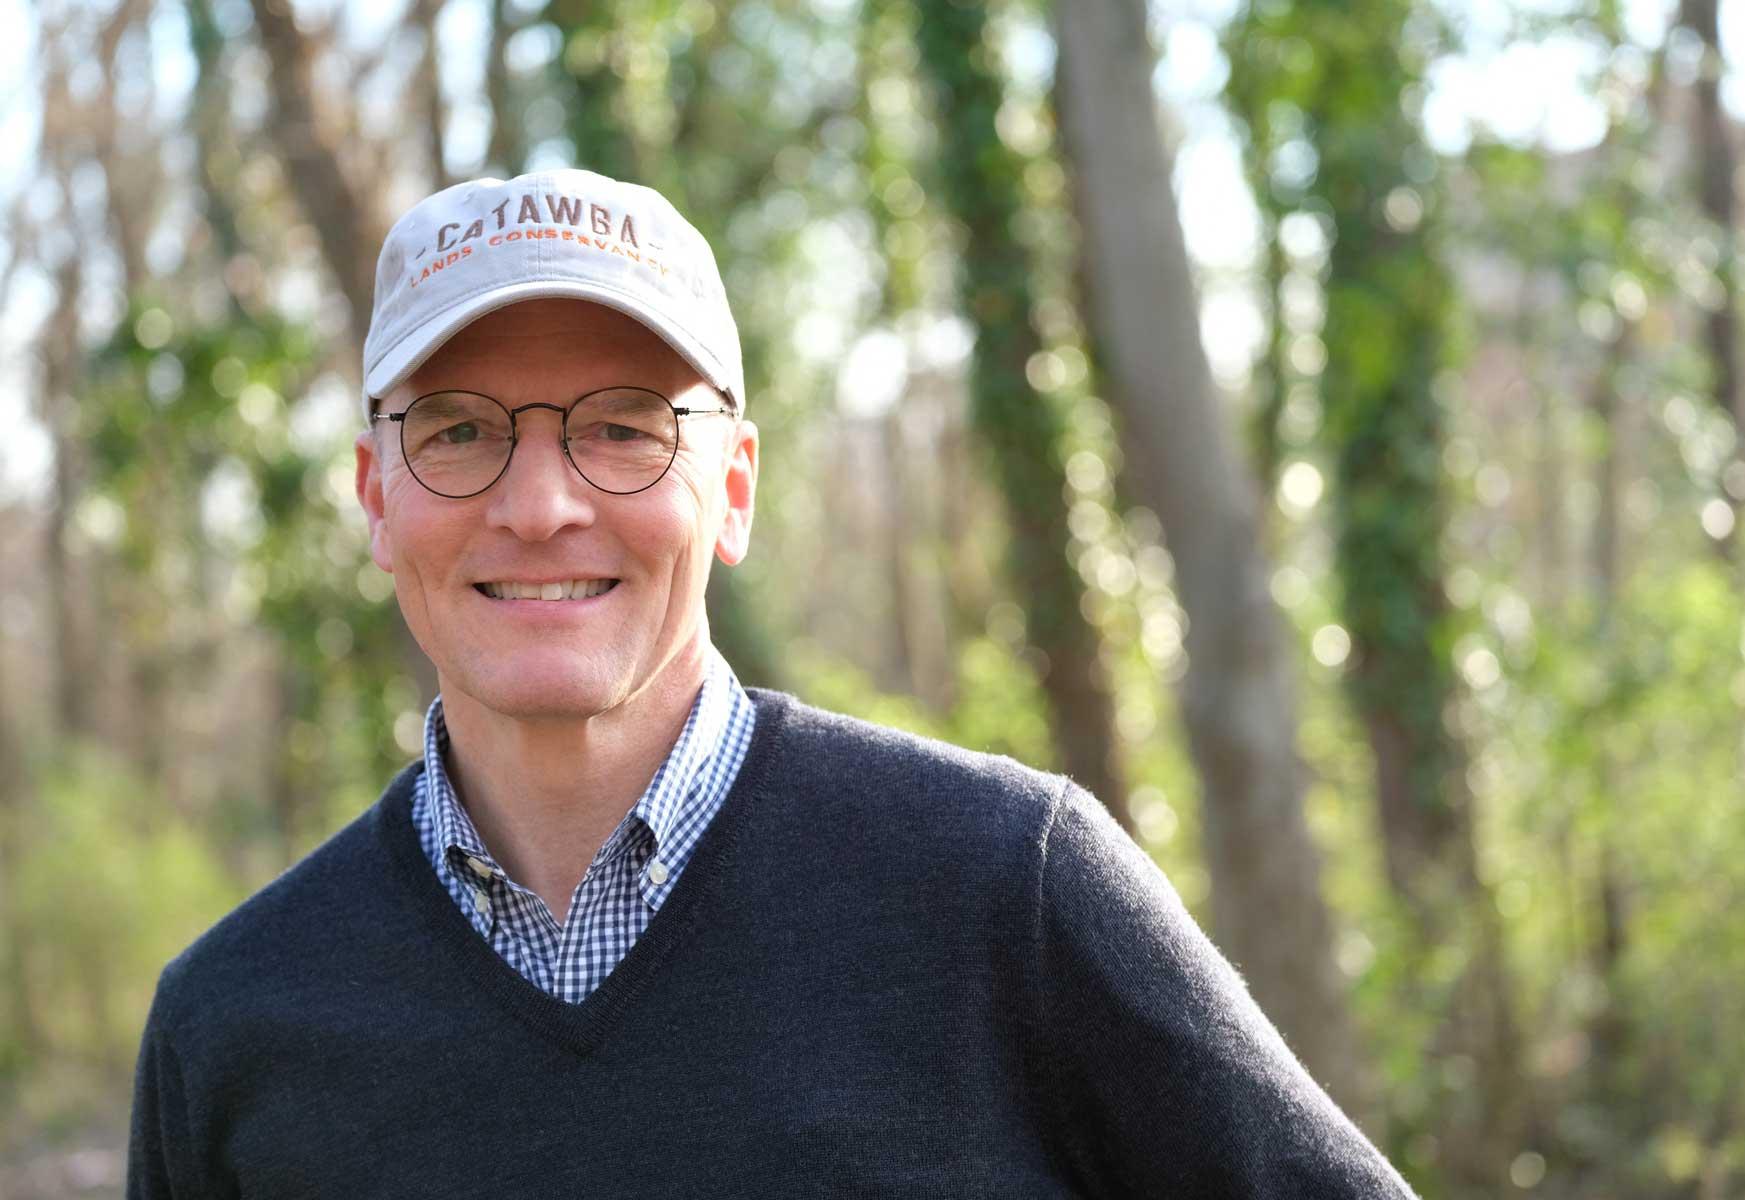 Staff Members | Catawba Lands Conservancy